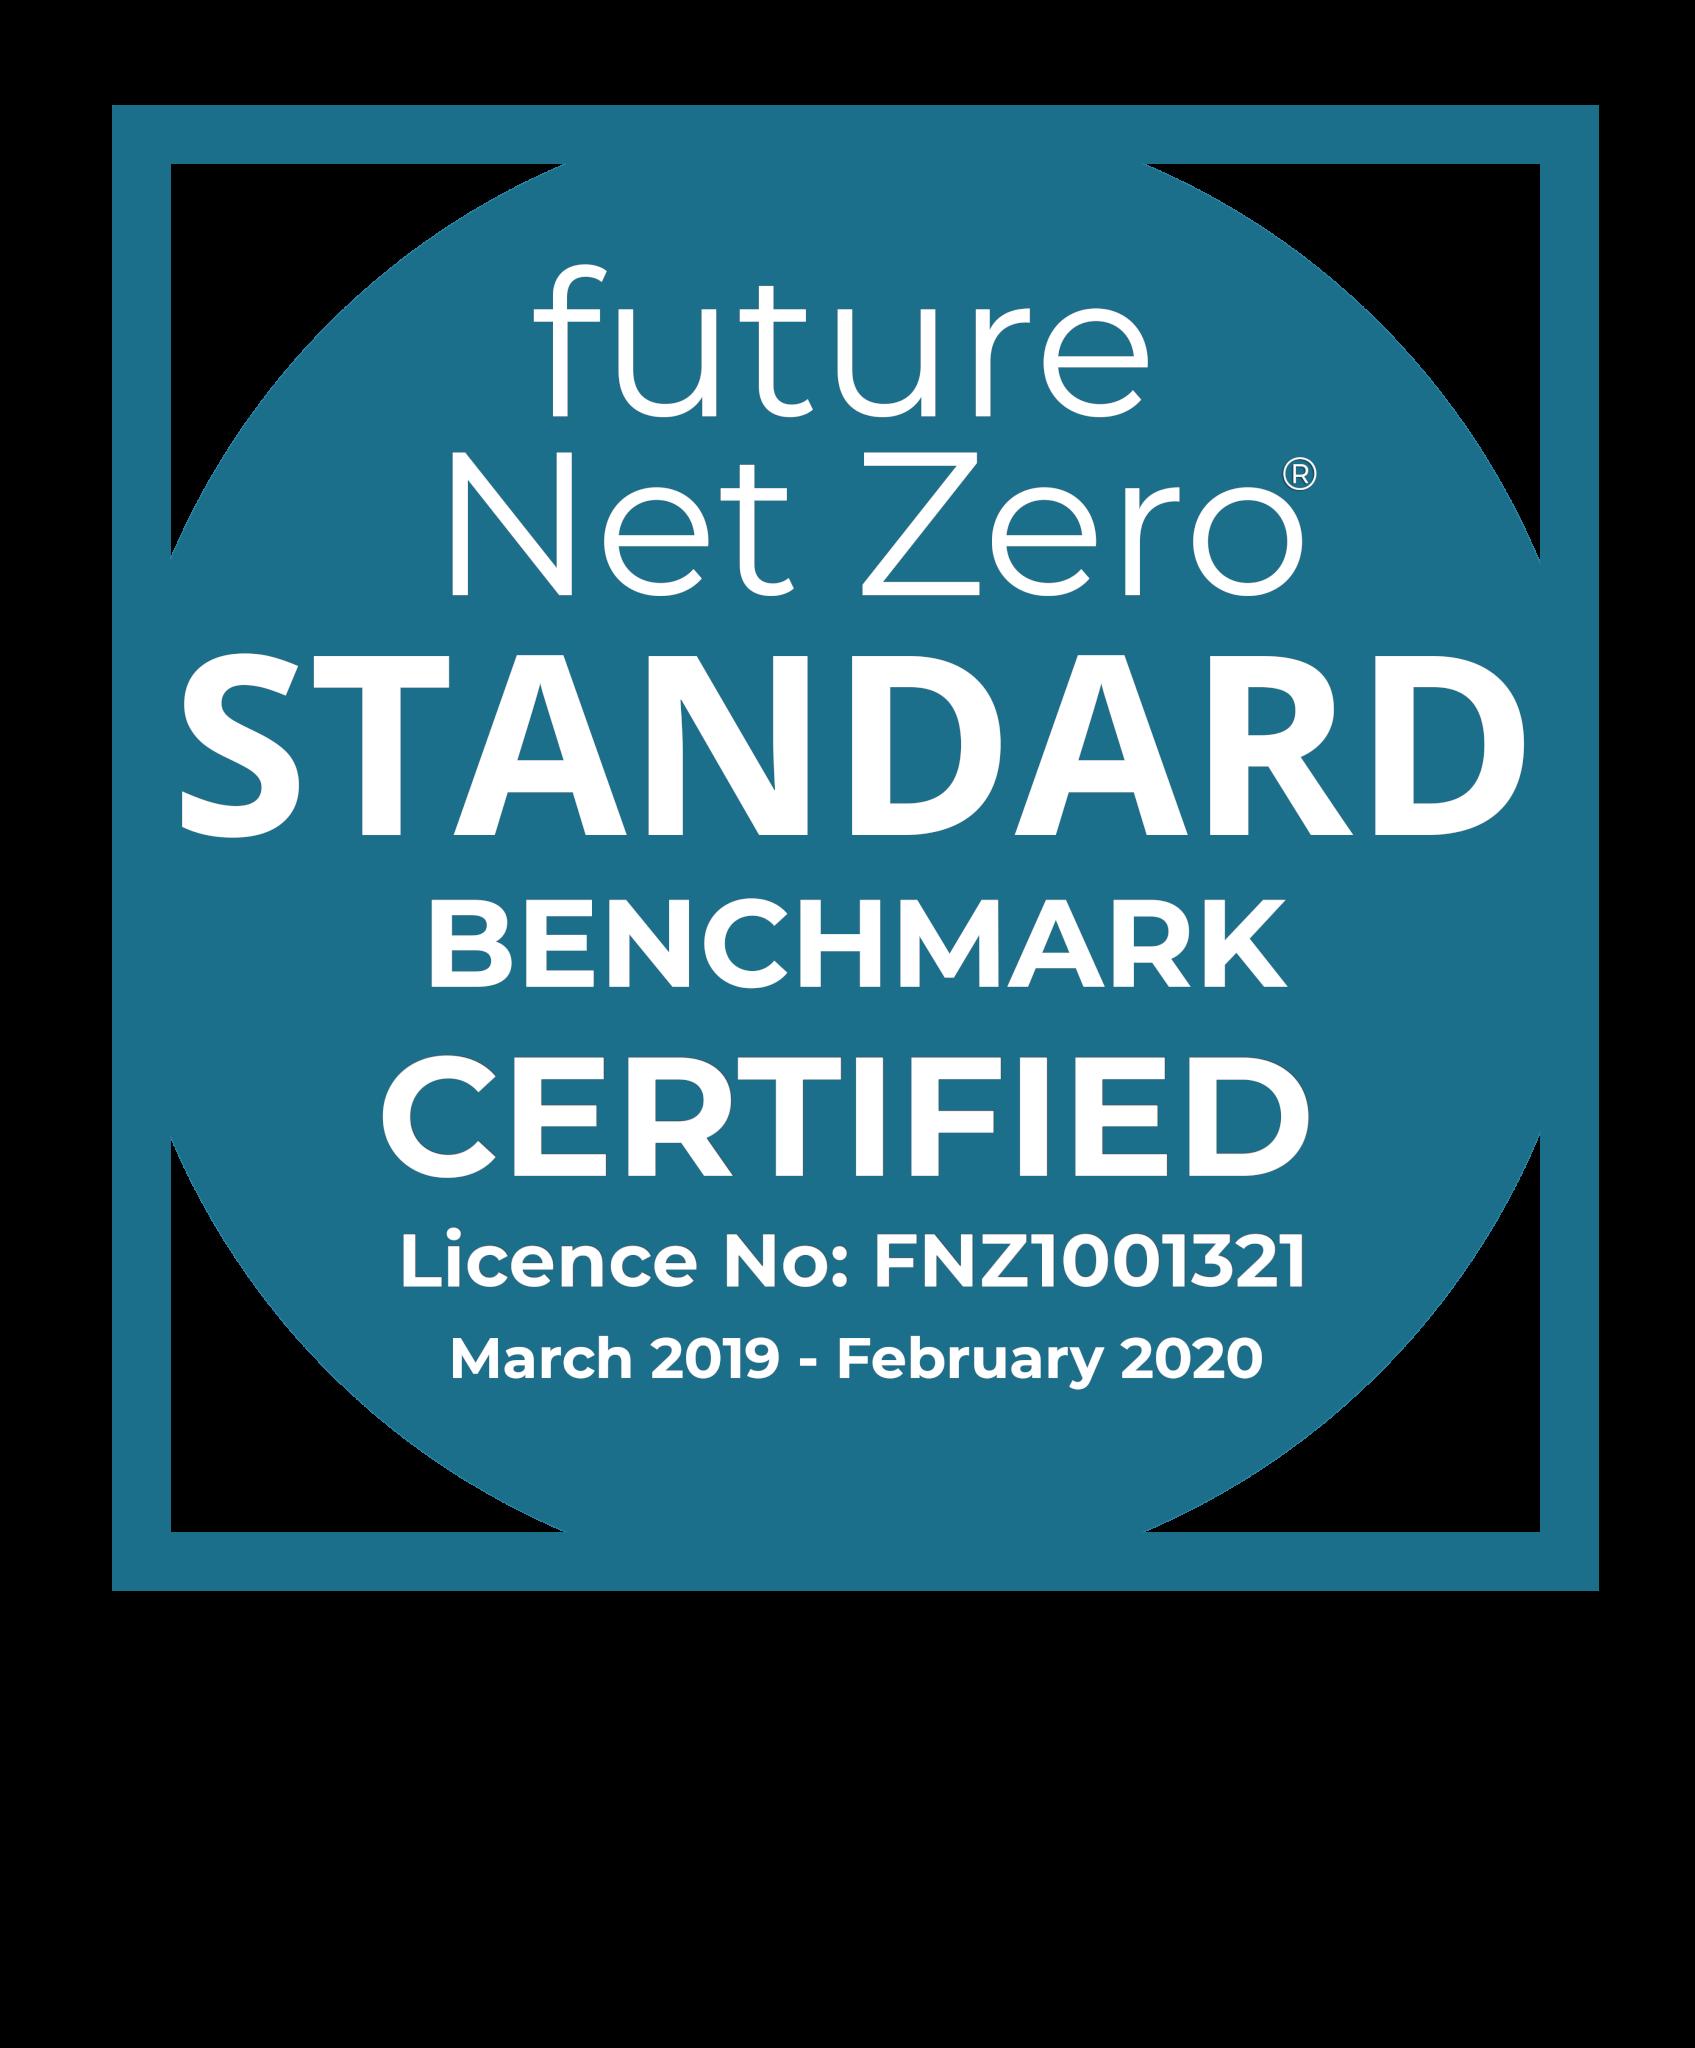 FNZ Standard Badge CERTIFIED BENCHMARK - Scott Richards